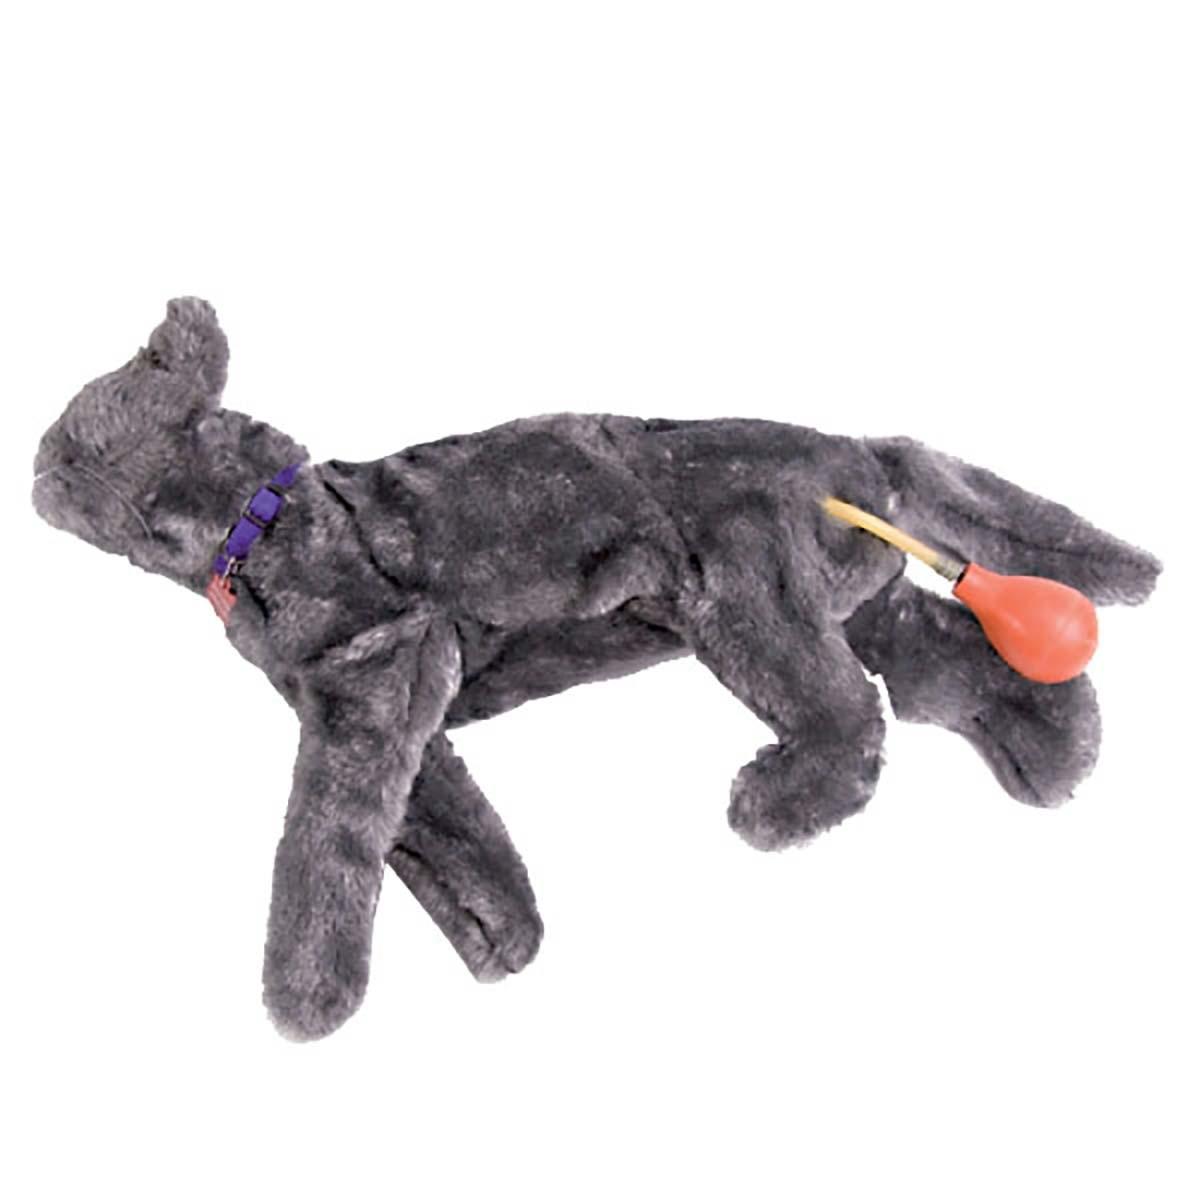 Fluffy Katzen-HLW-Übungsmodell